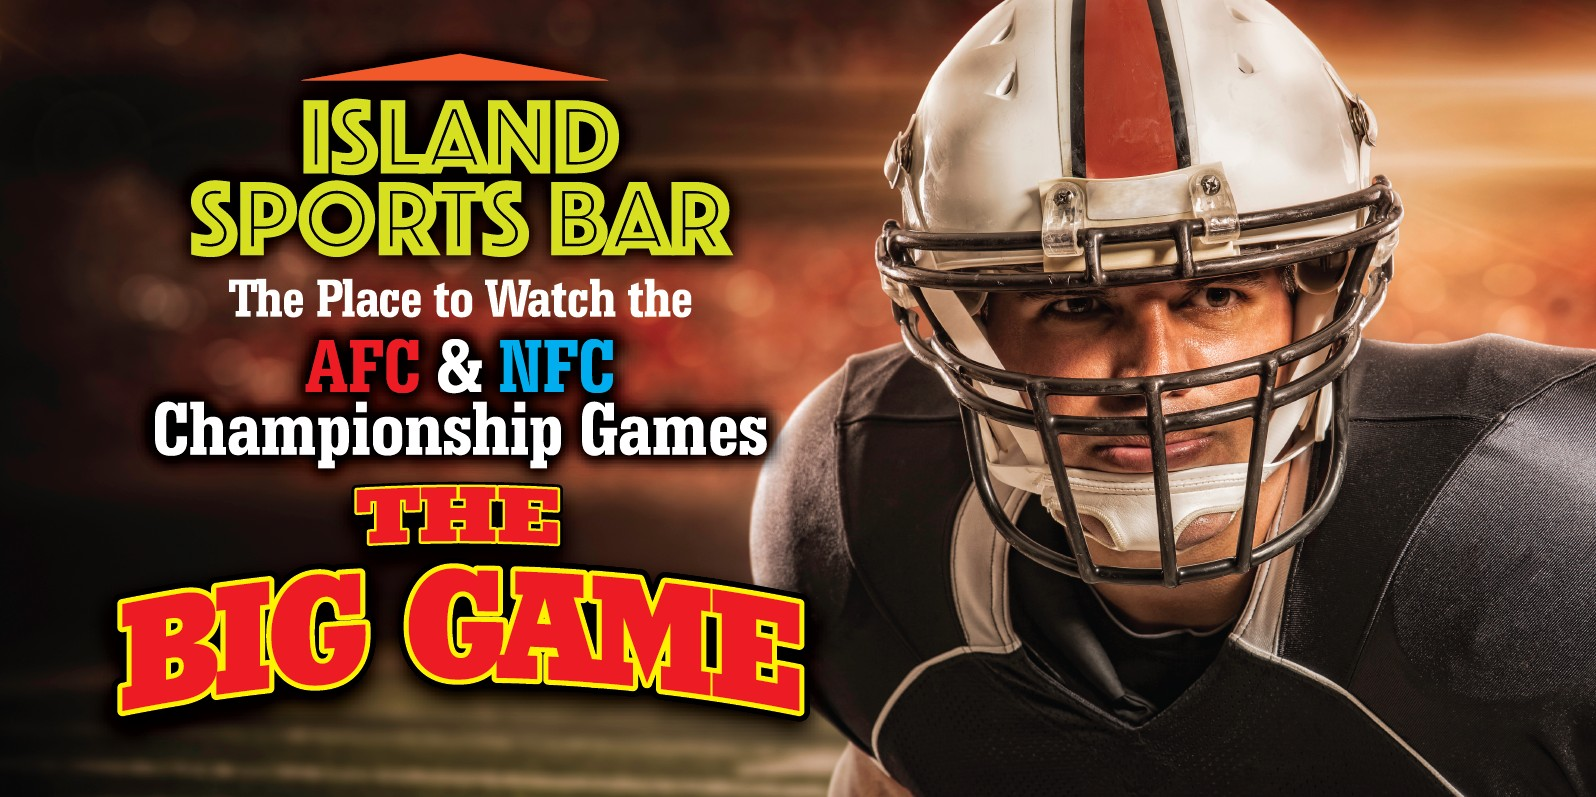 Sports Bar-Big Game Web Image